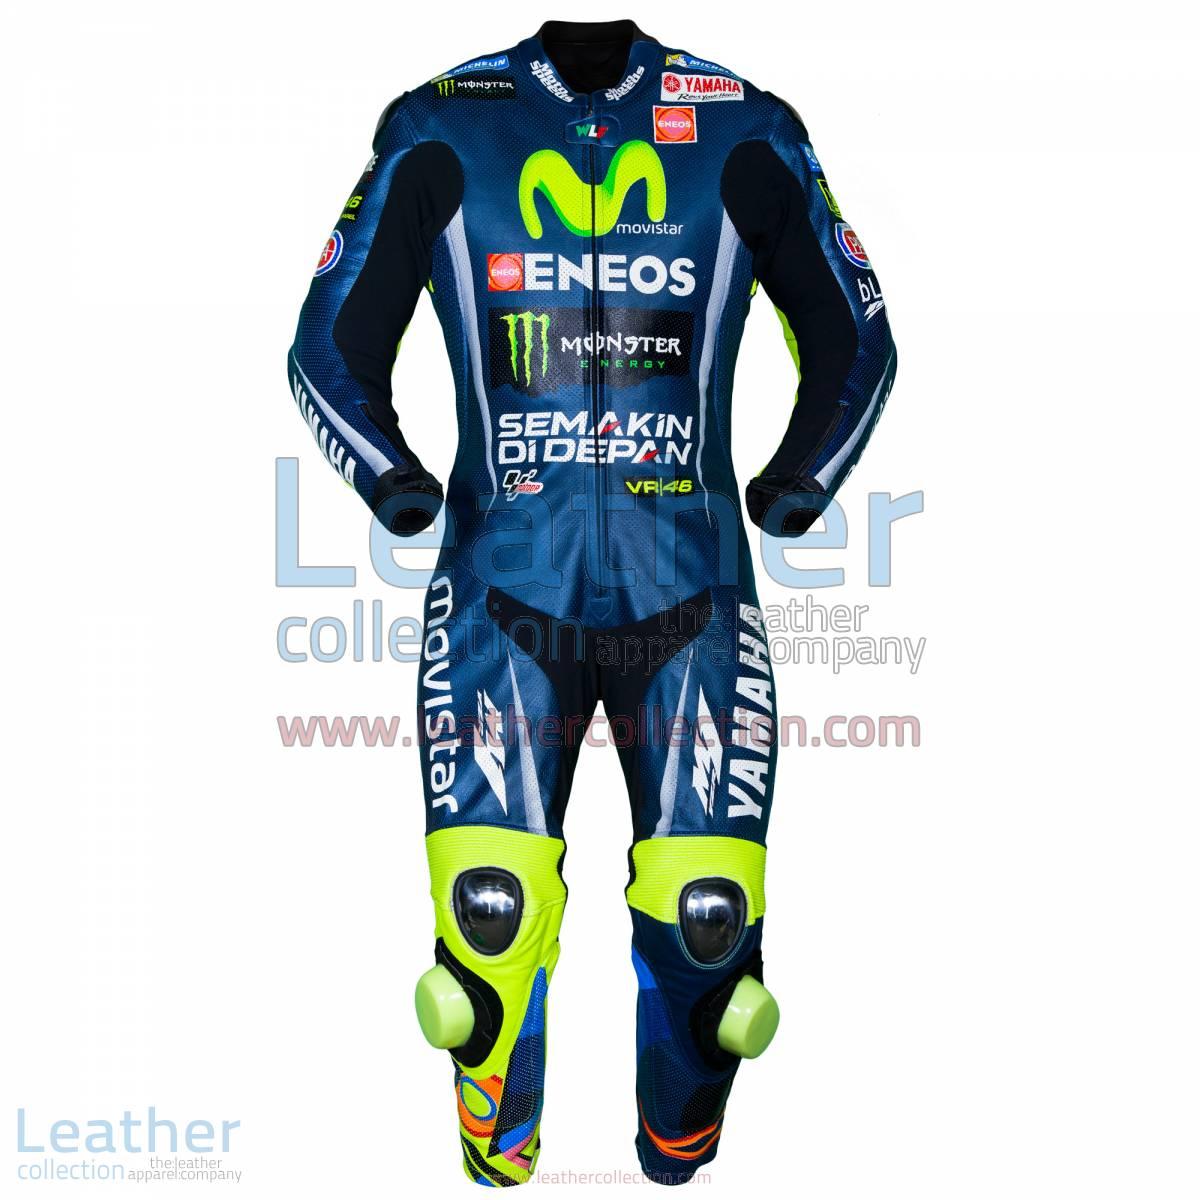 Valentino Rossi Movistar Yamaha MotoGP 2017 Race Suit | Valentino Rossi Suit